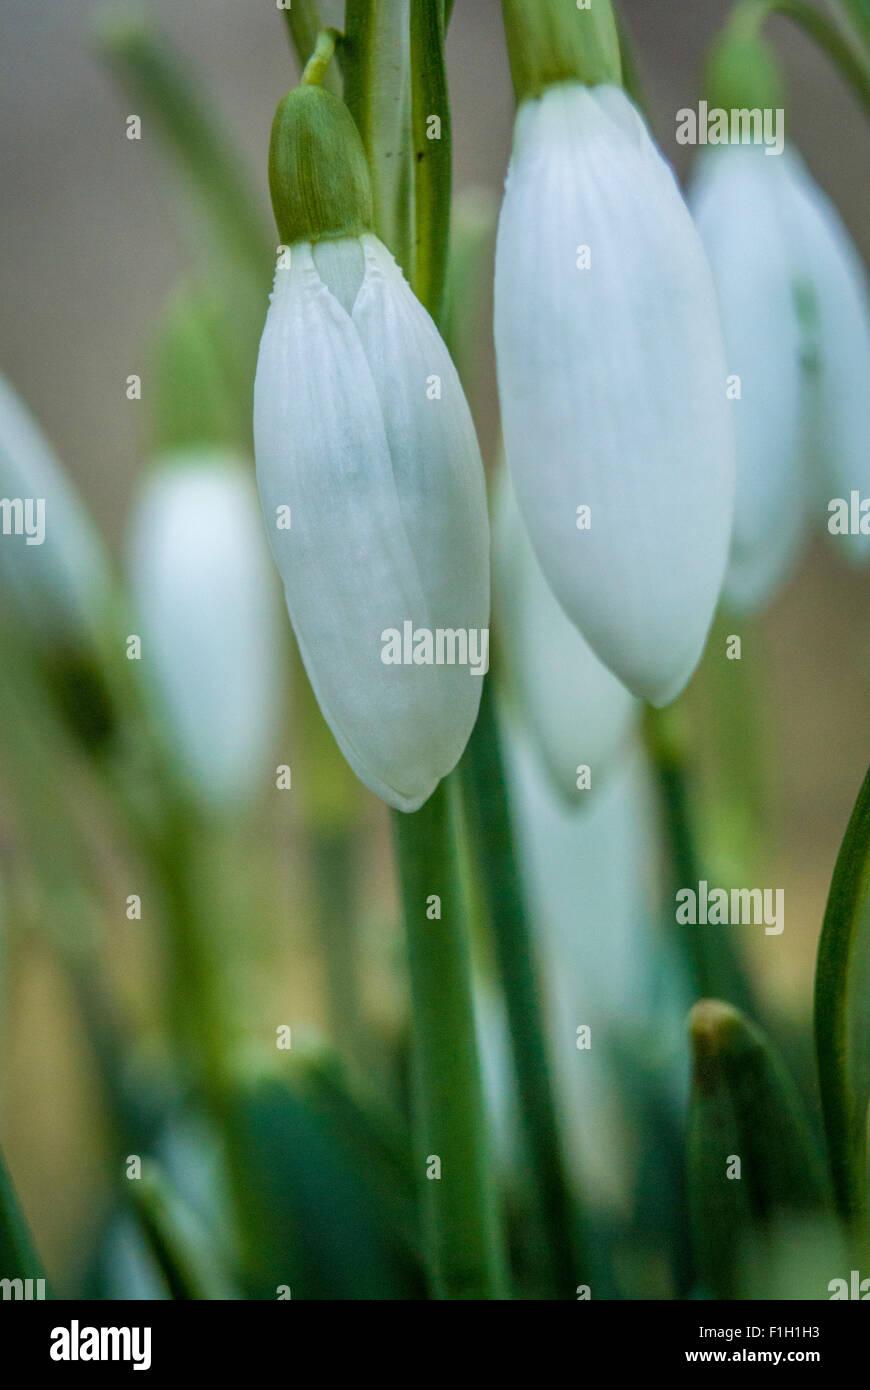 Snowdrops - close up - Stock Image